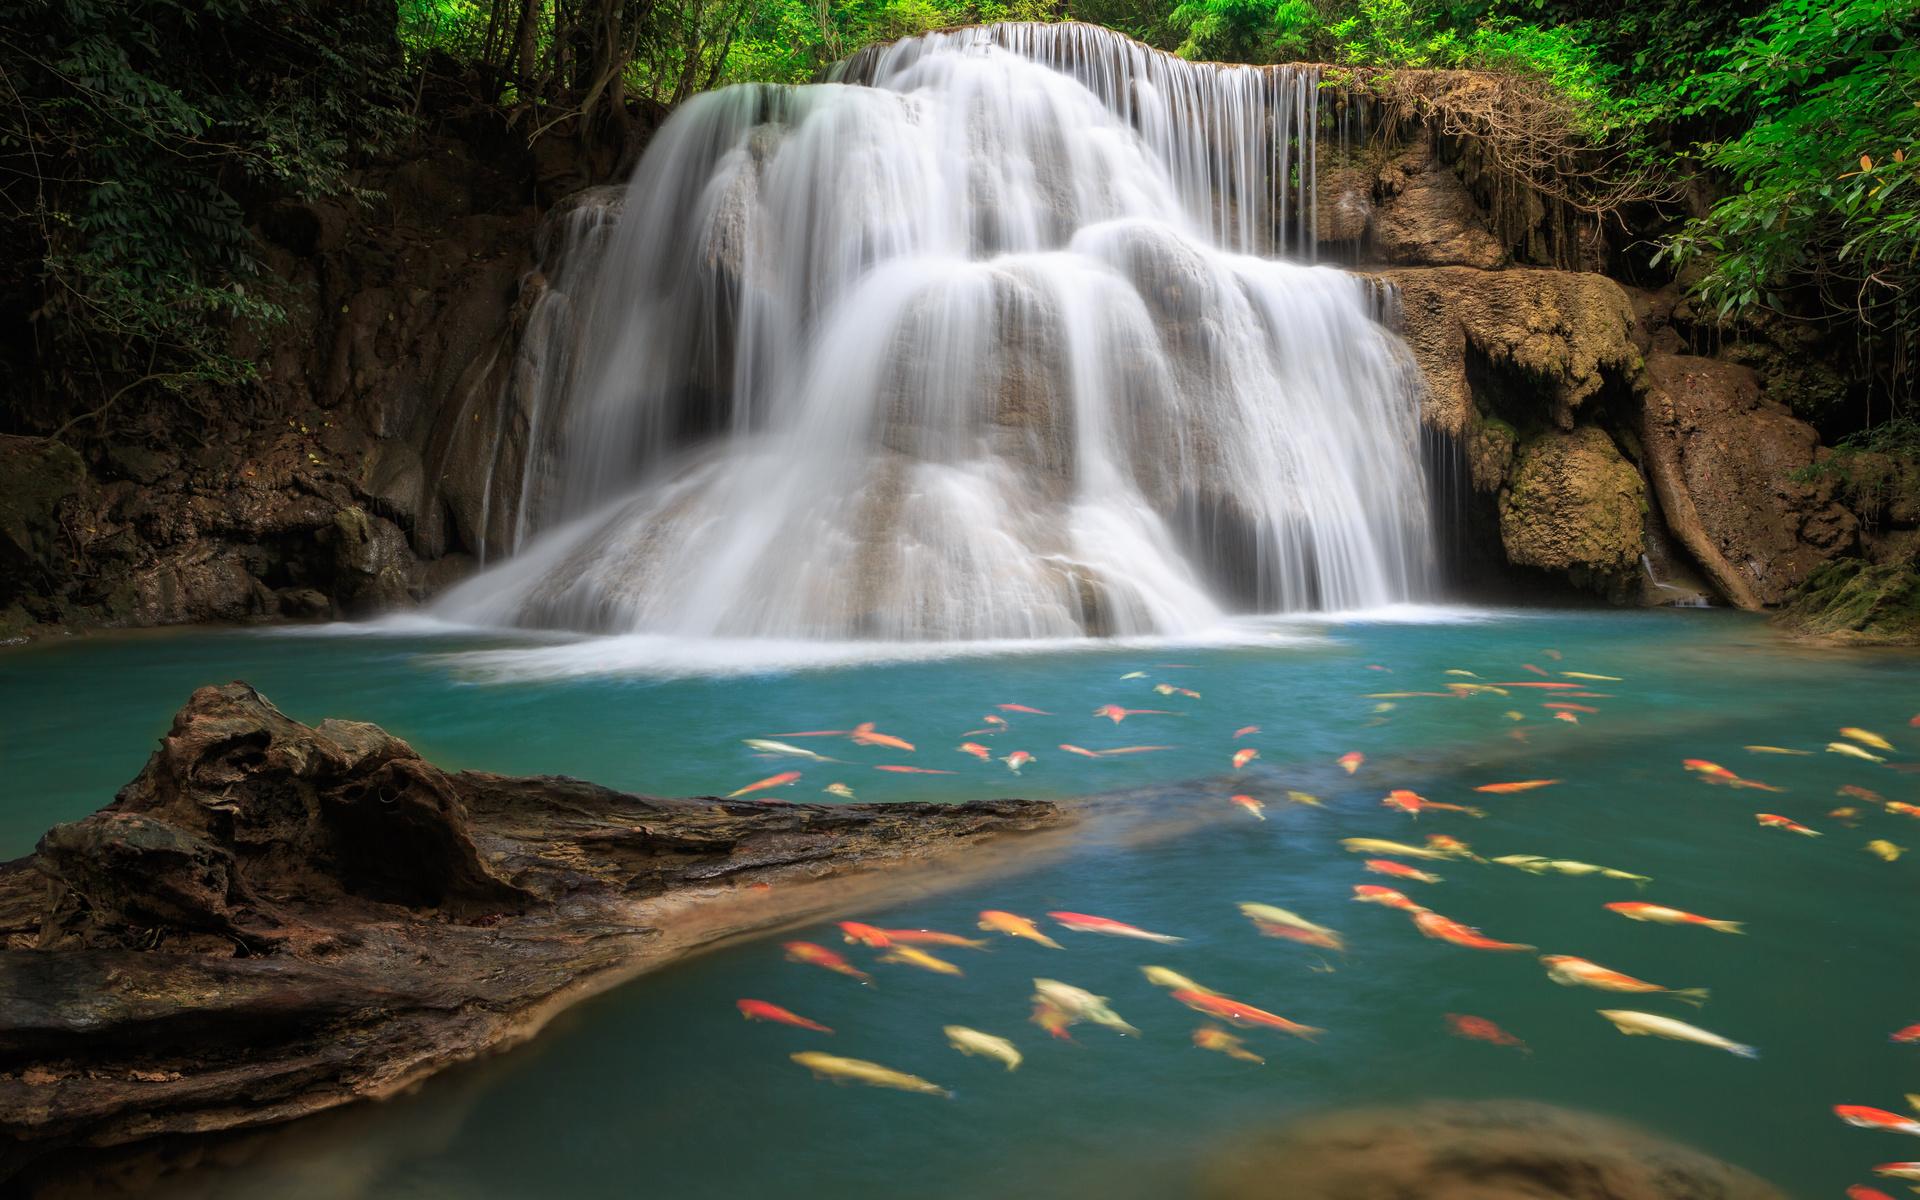 кухни вода море водопад картинки на телефон днём